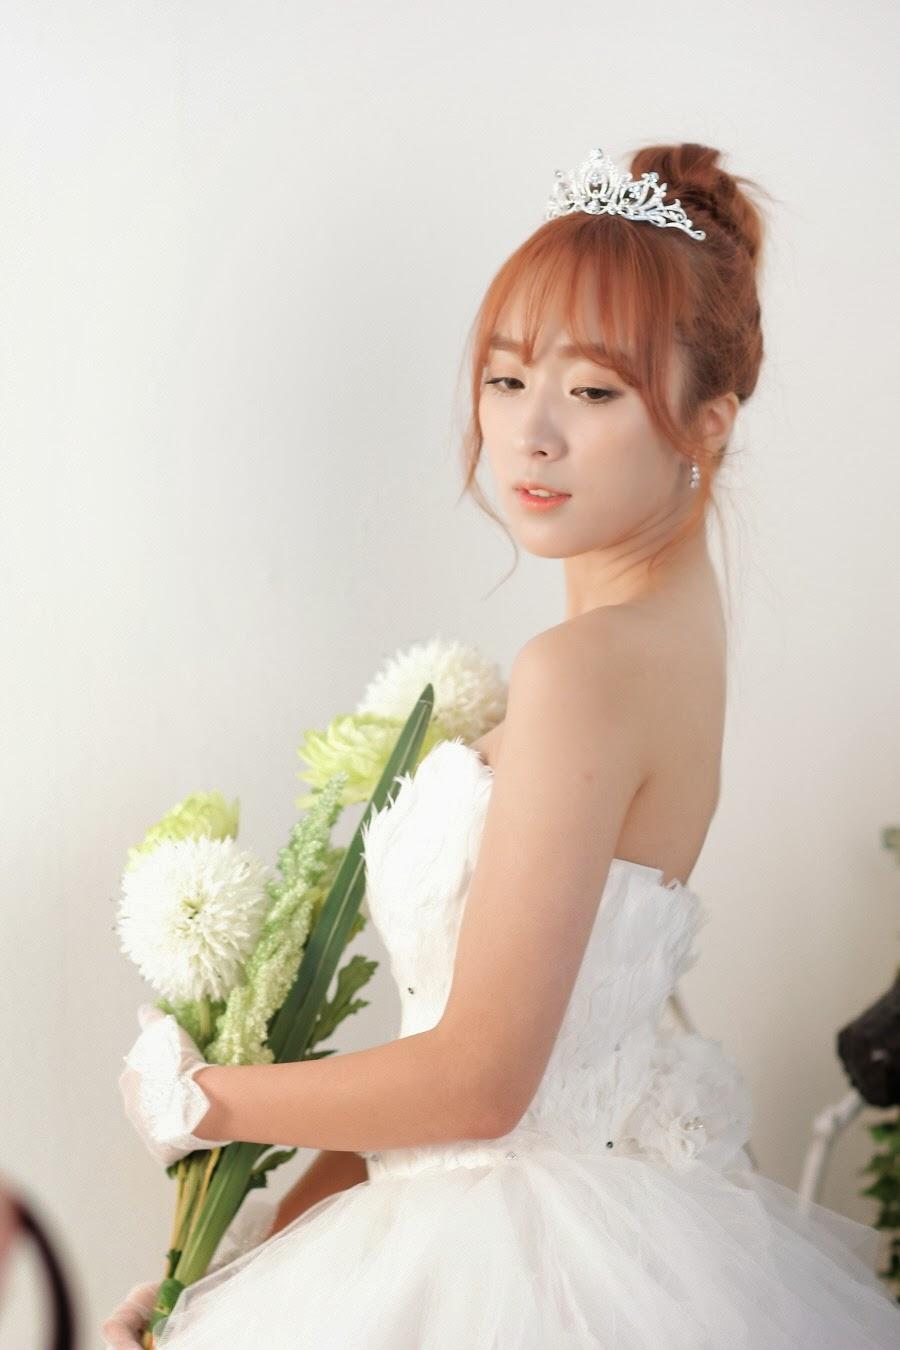 Minah Model Gorgeous Bride